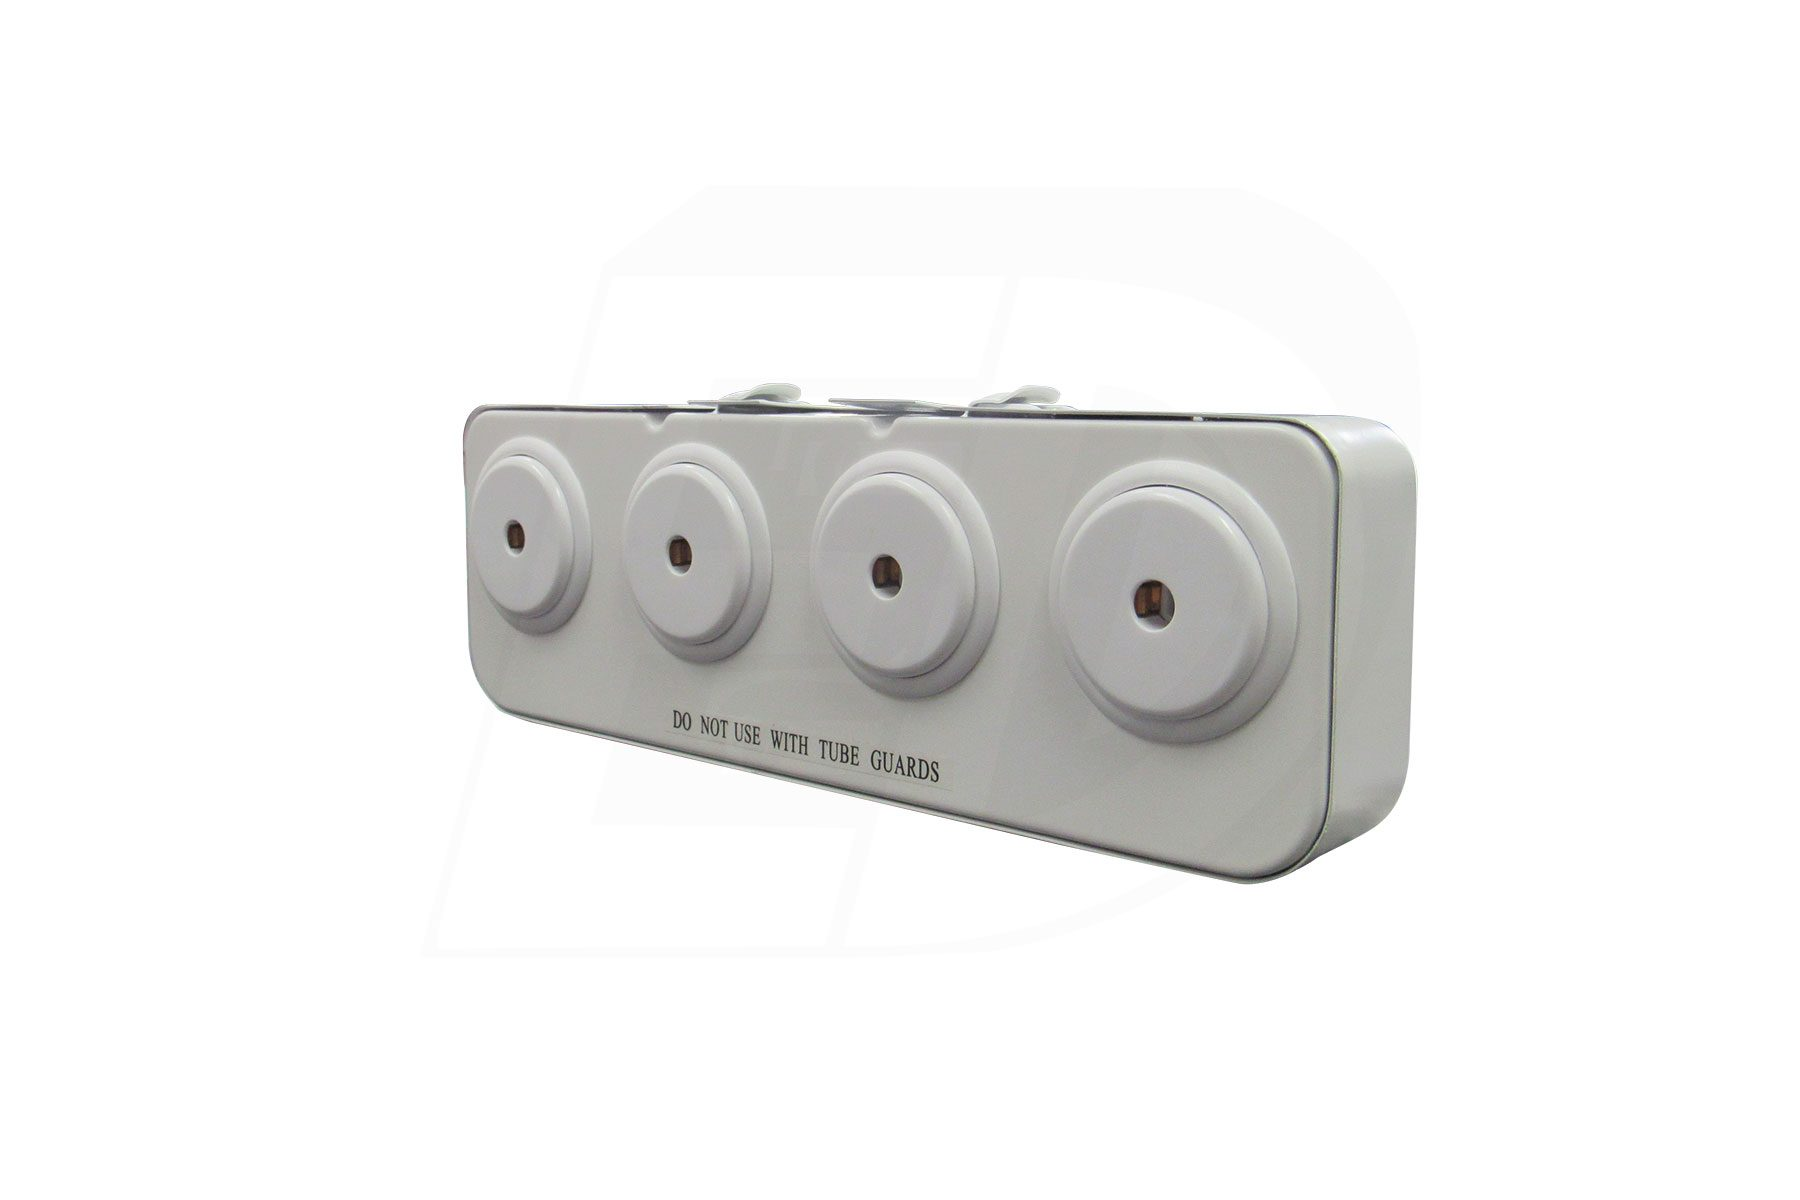 4 Lamps Turret T8, T10,T12 Slim High Output Lamp Holder Fluorescent Light Socket